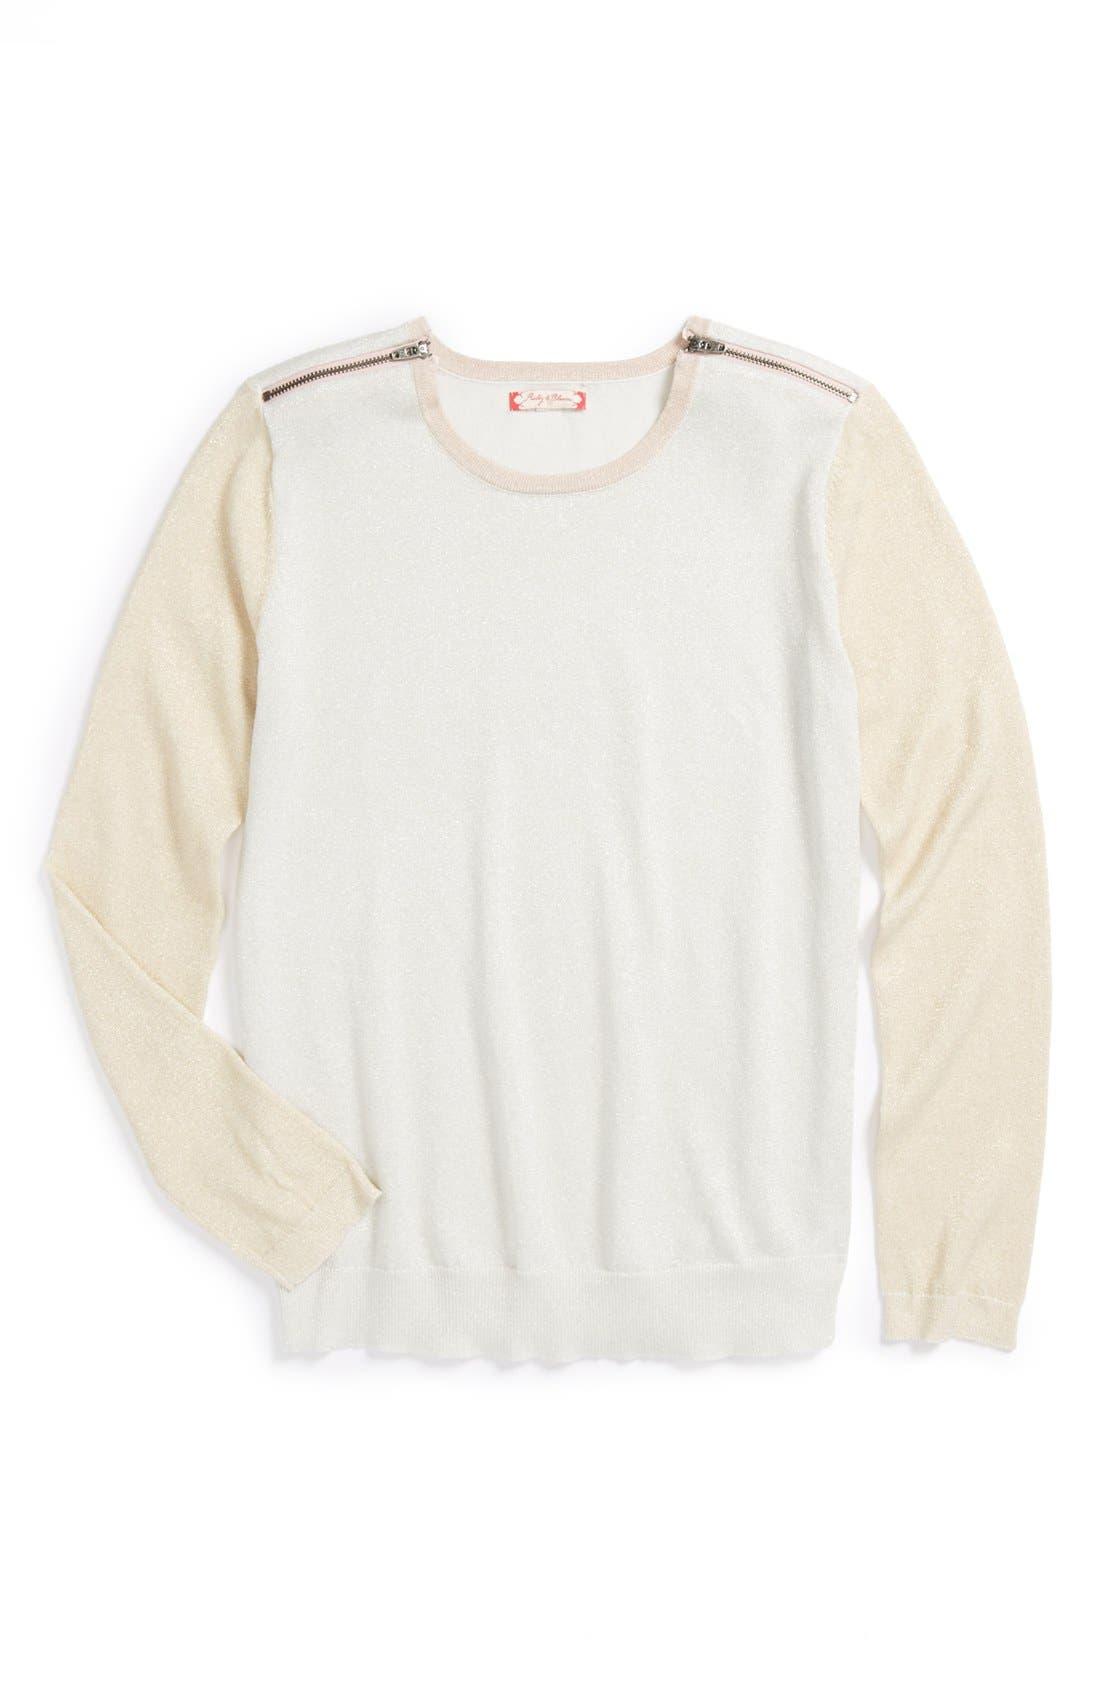 Alternate Image 1 Selected - Ruby & Bloom 'Glitzy' Sweater (Big Girls)